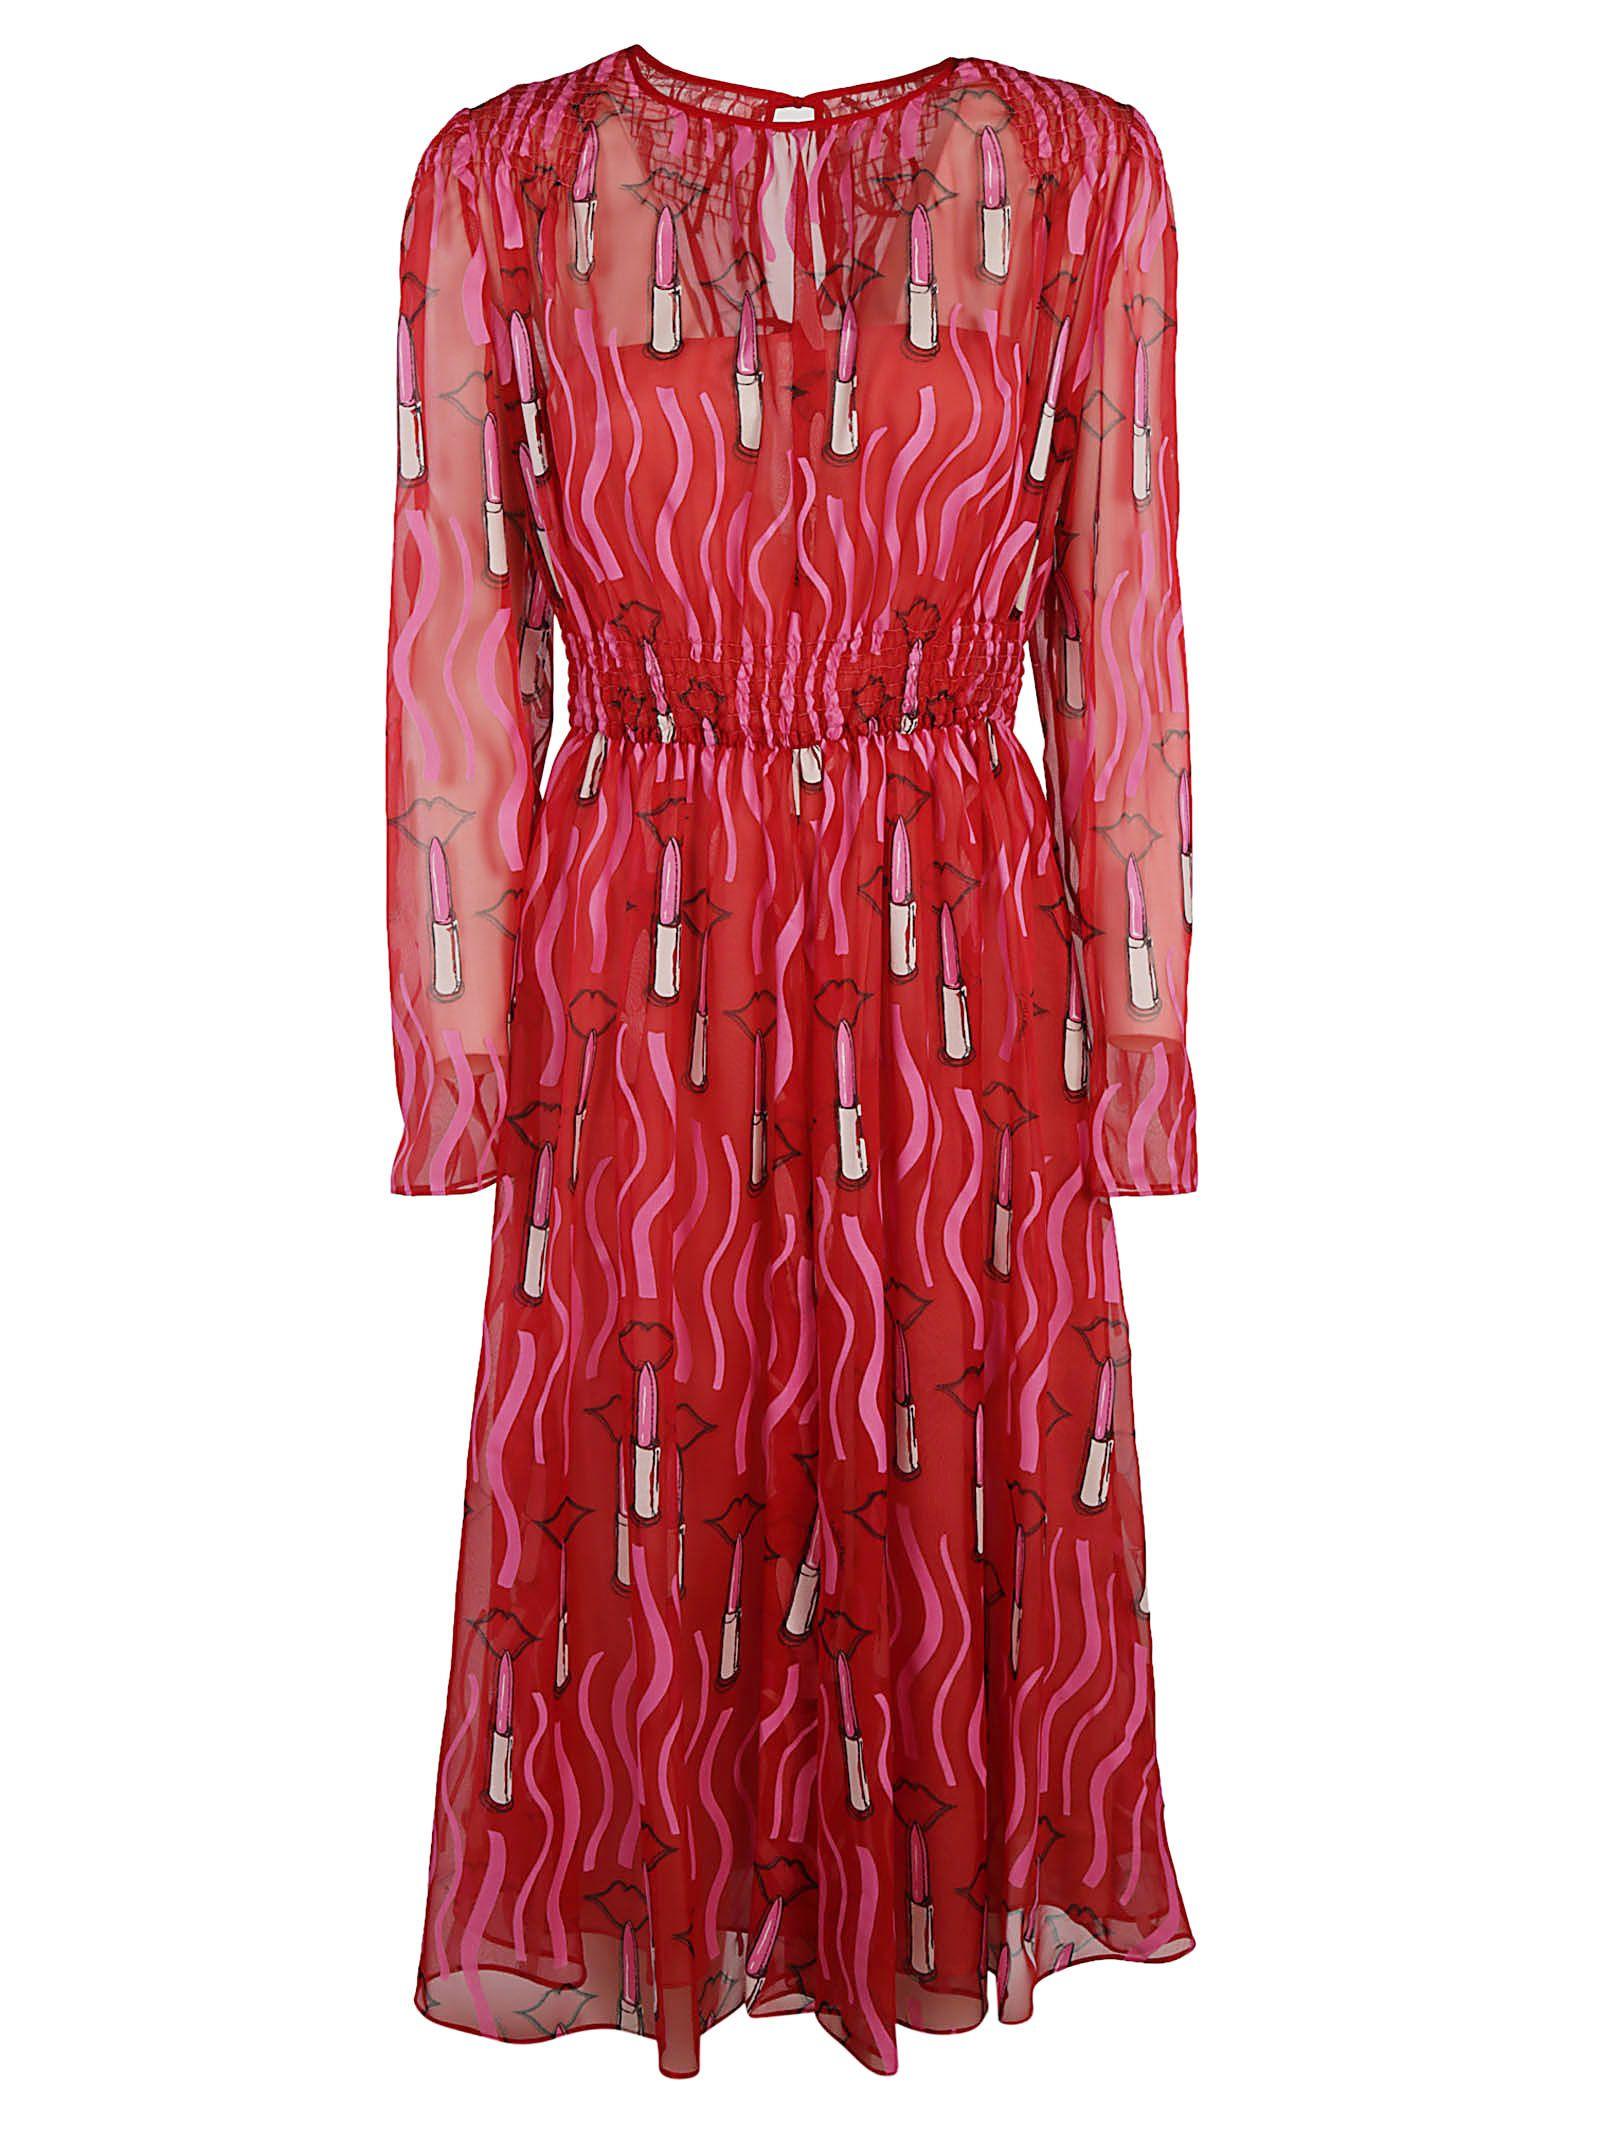 Valentino Lipstick Print Dress